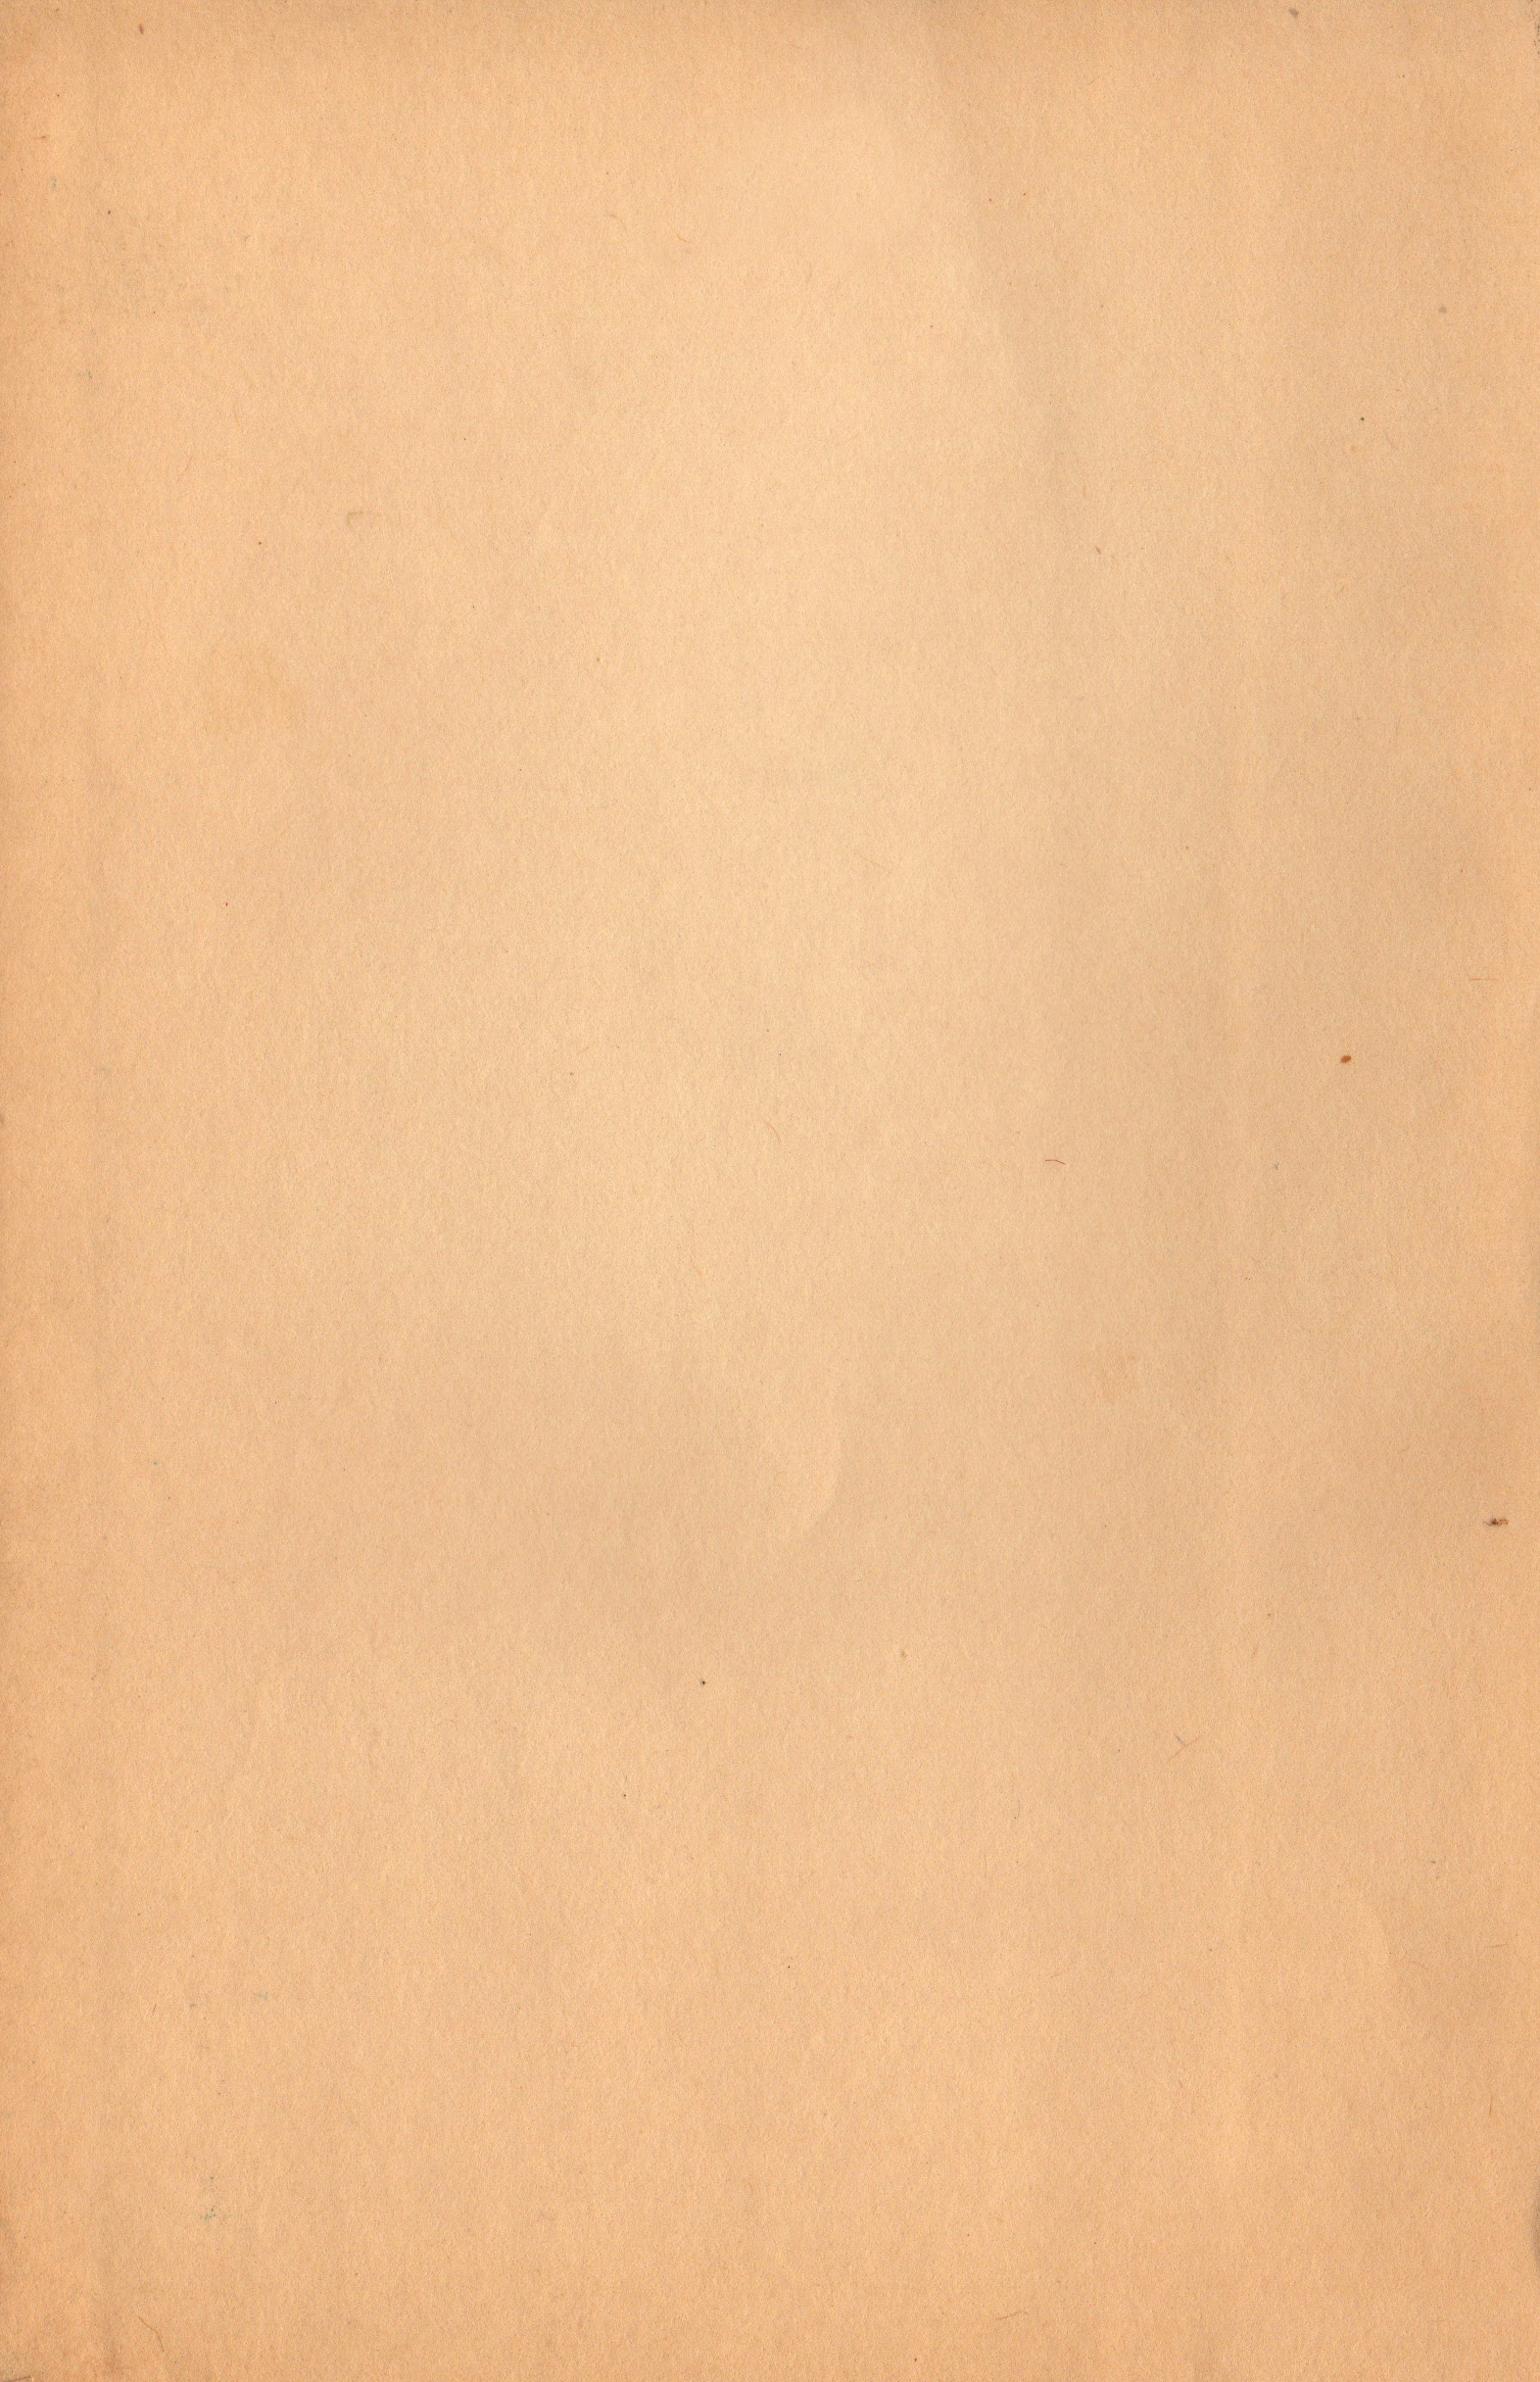 Old vintage paper texture photo